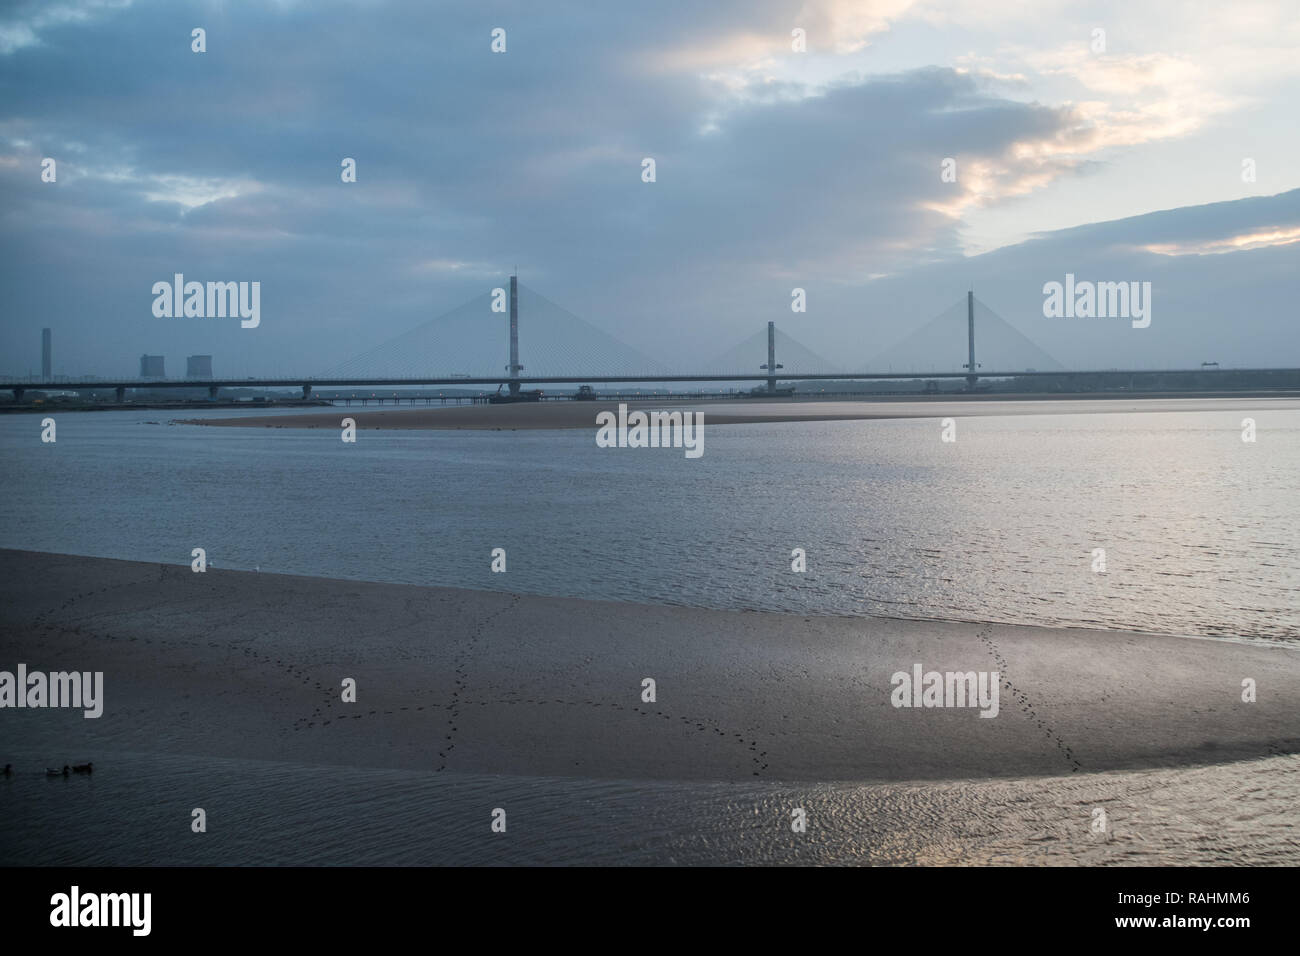 The Mersey Gateway Bridge construction, 2014-2017. Various stages of the construction of the bridge between Widnes & Runcorn (Halton) on River Mersey - Stock Image